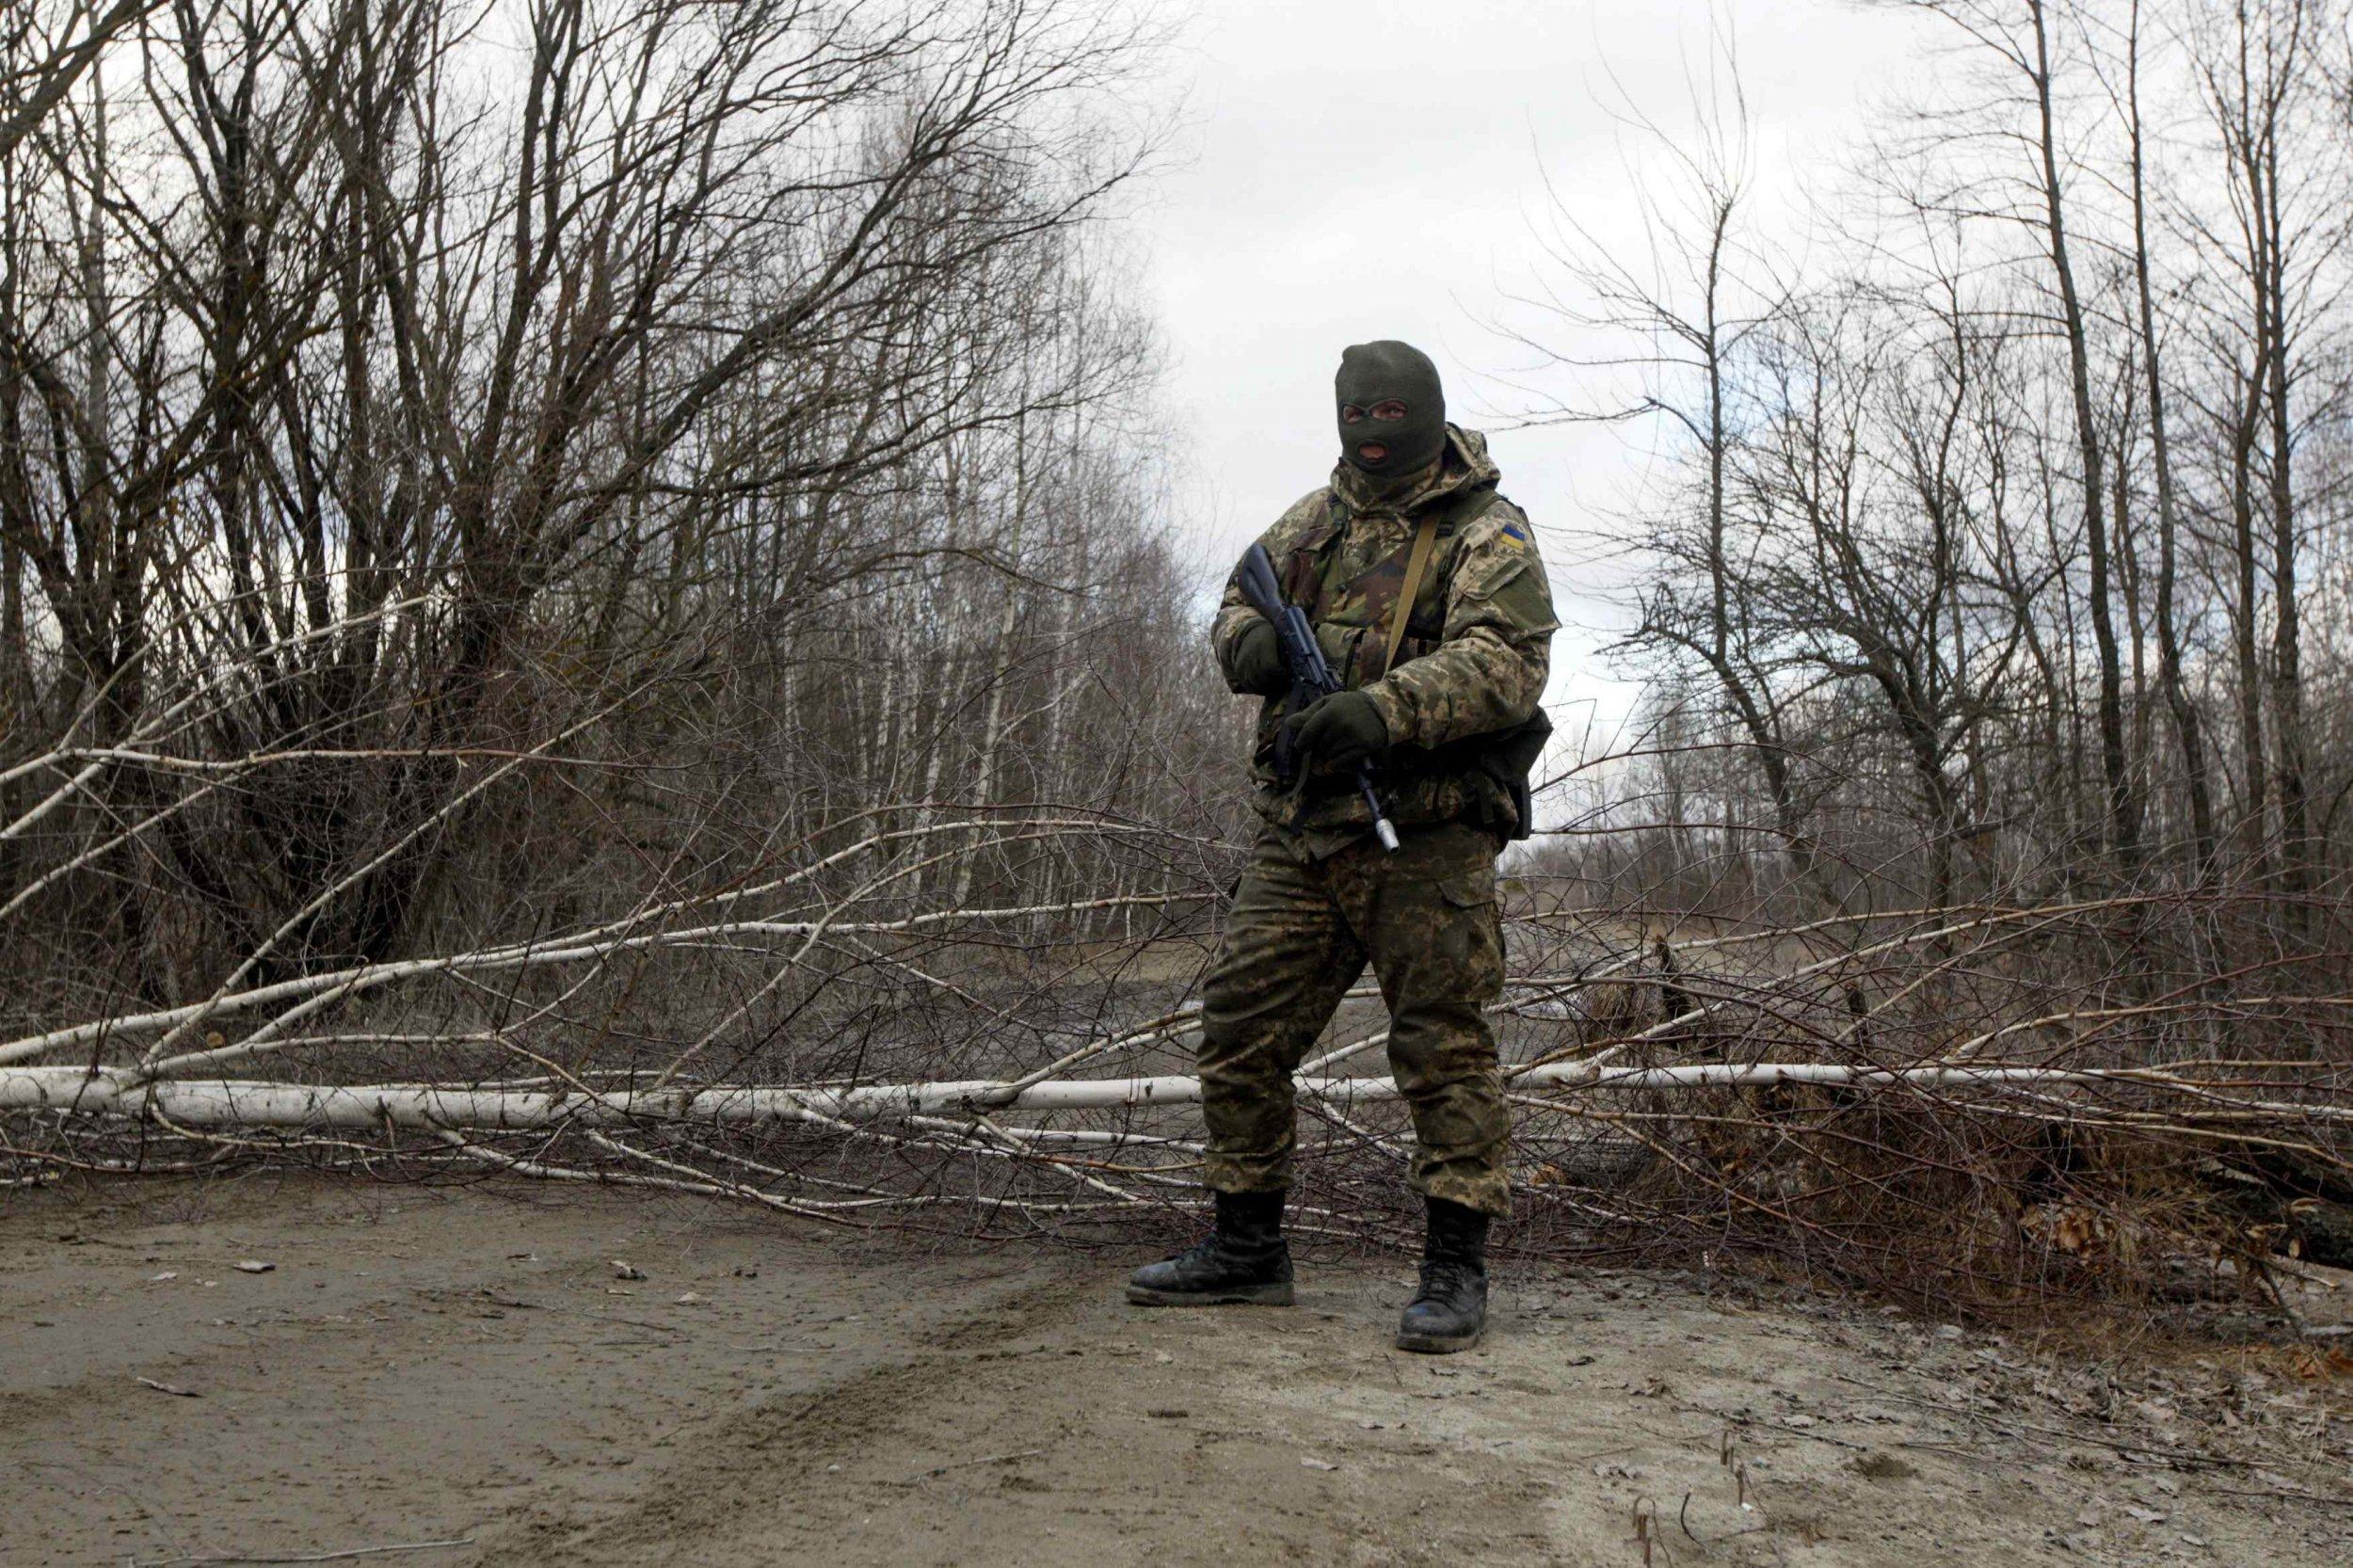 2015-03-06T165405Z_495234104_GM1EB3702EJ01_RTRMADP_3_UKRAINE-CRISIS